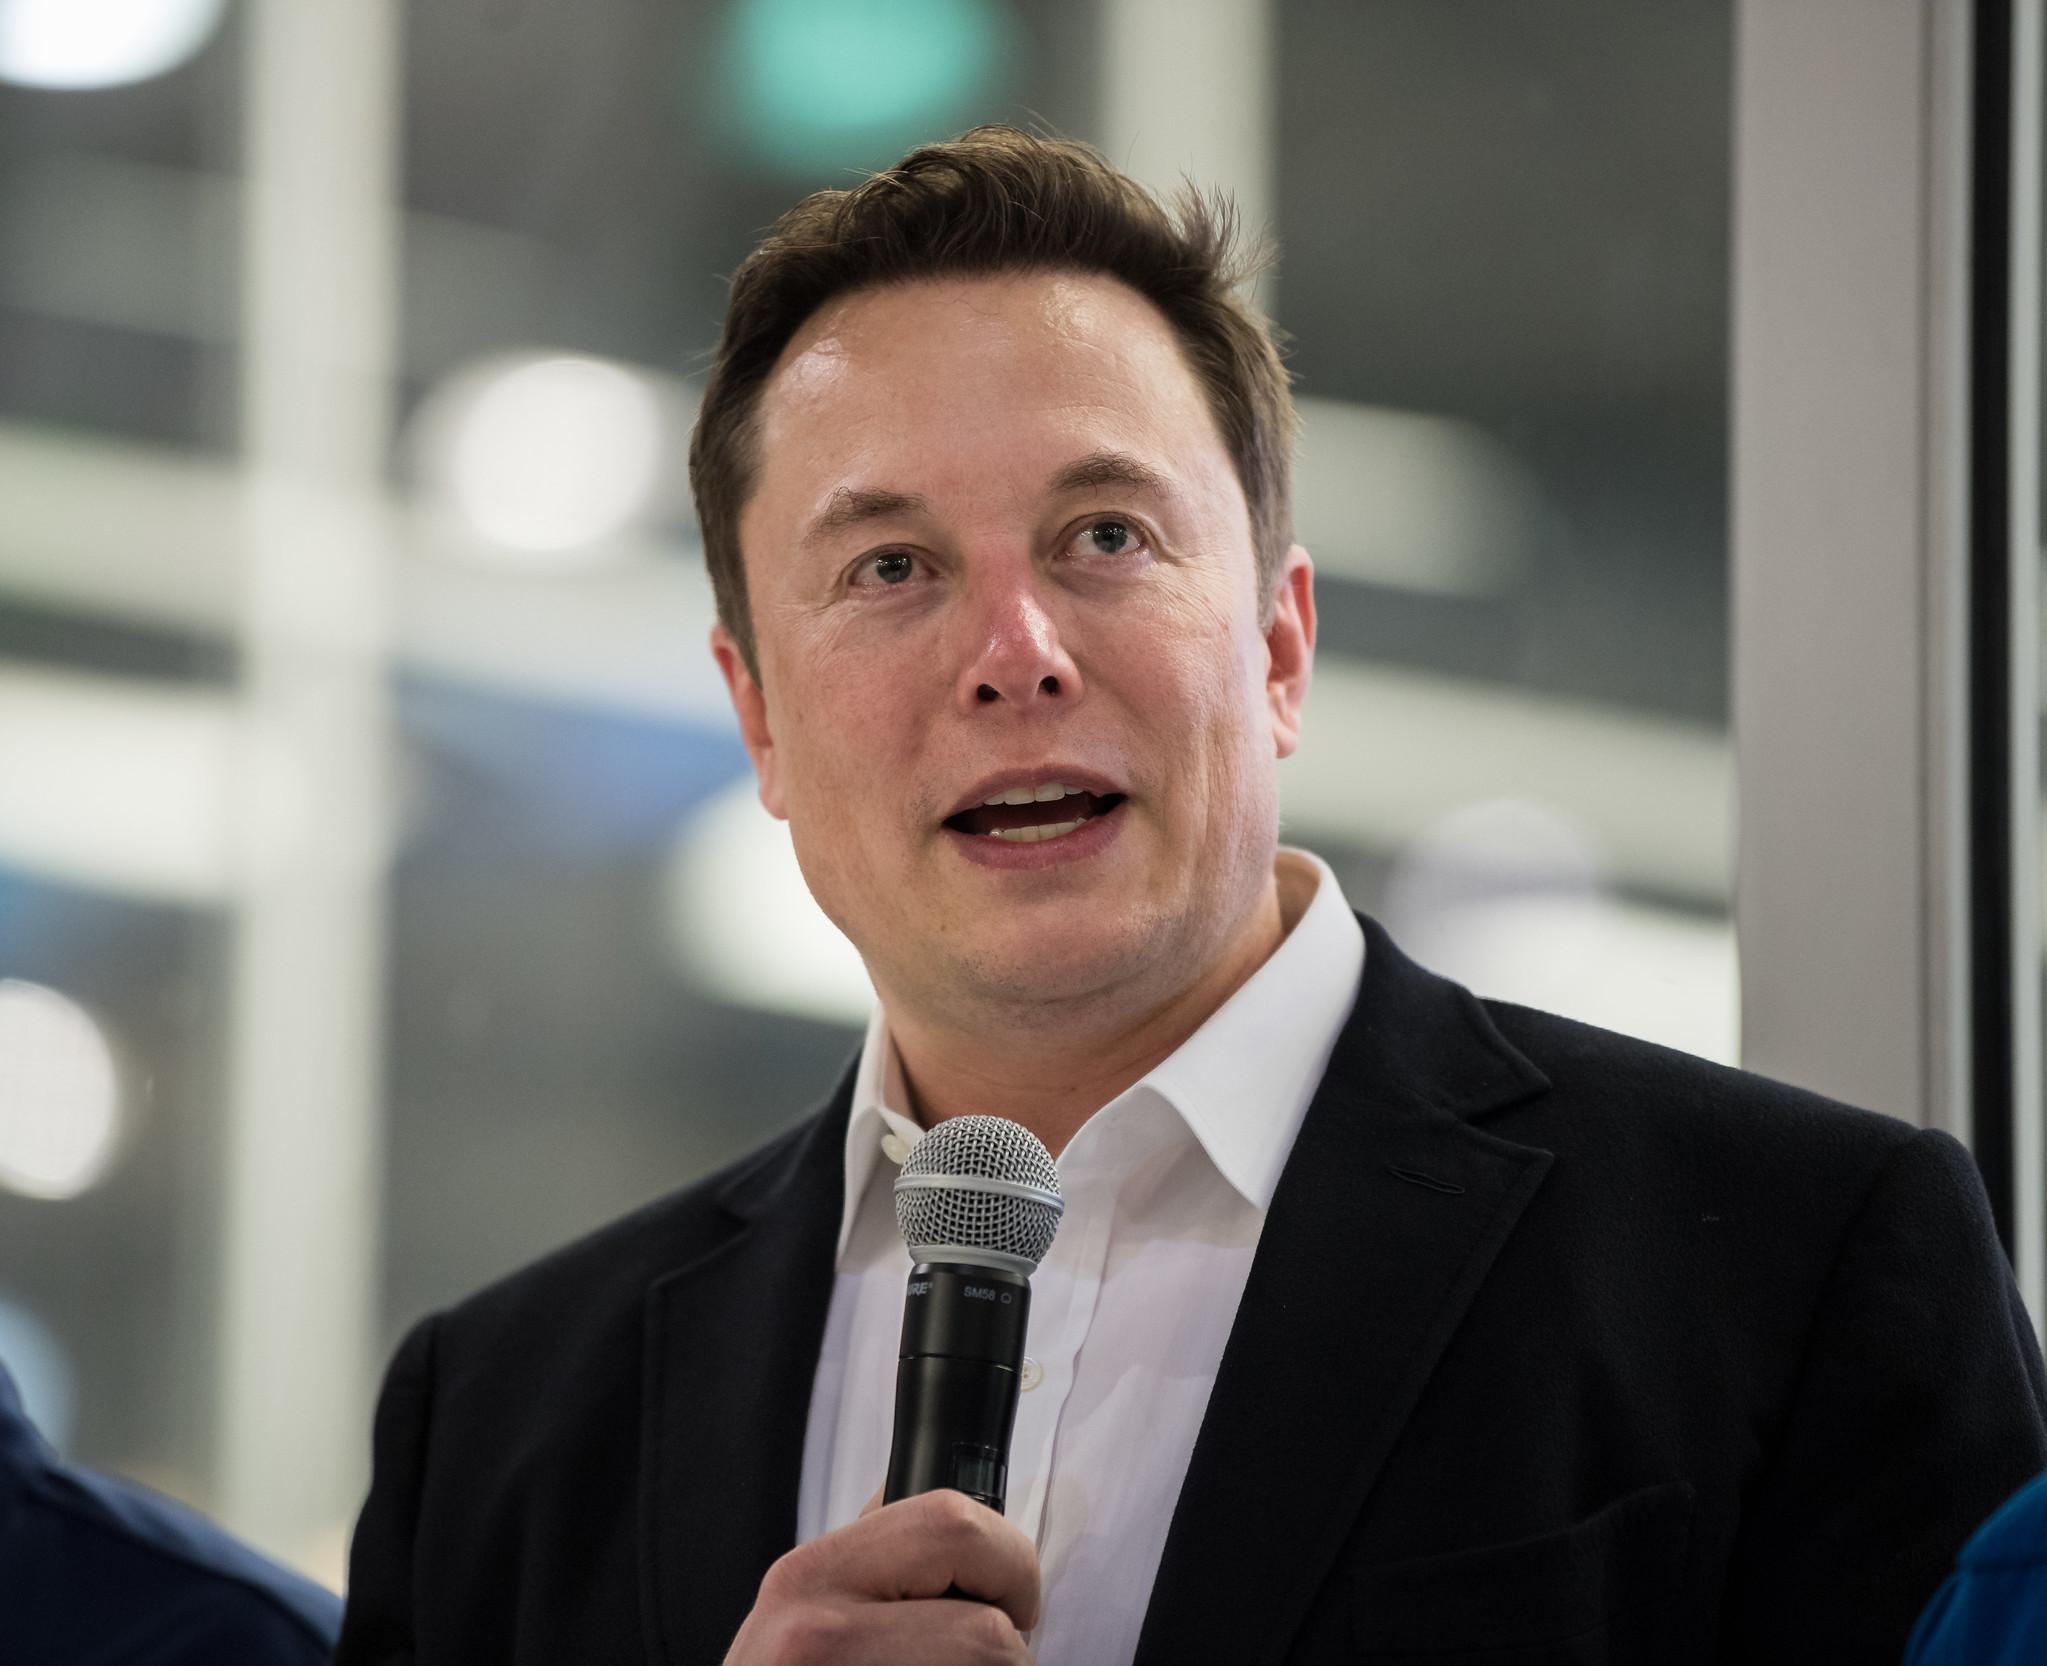 Tesla lands a lawsuit over SolarCity merge